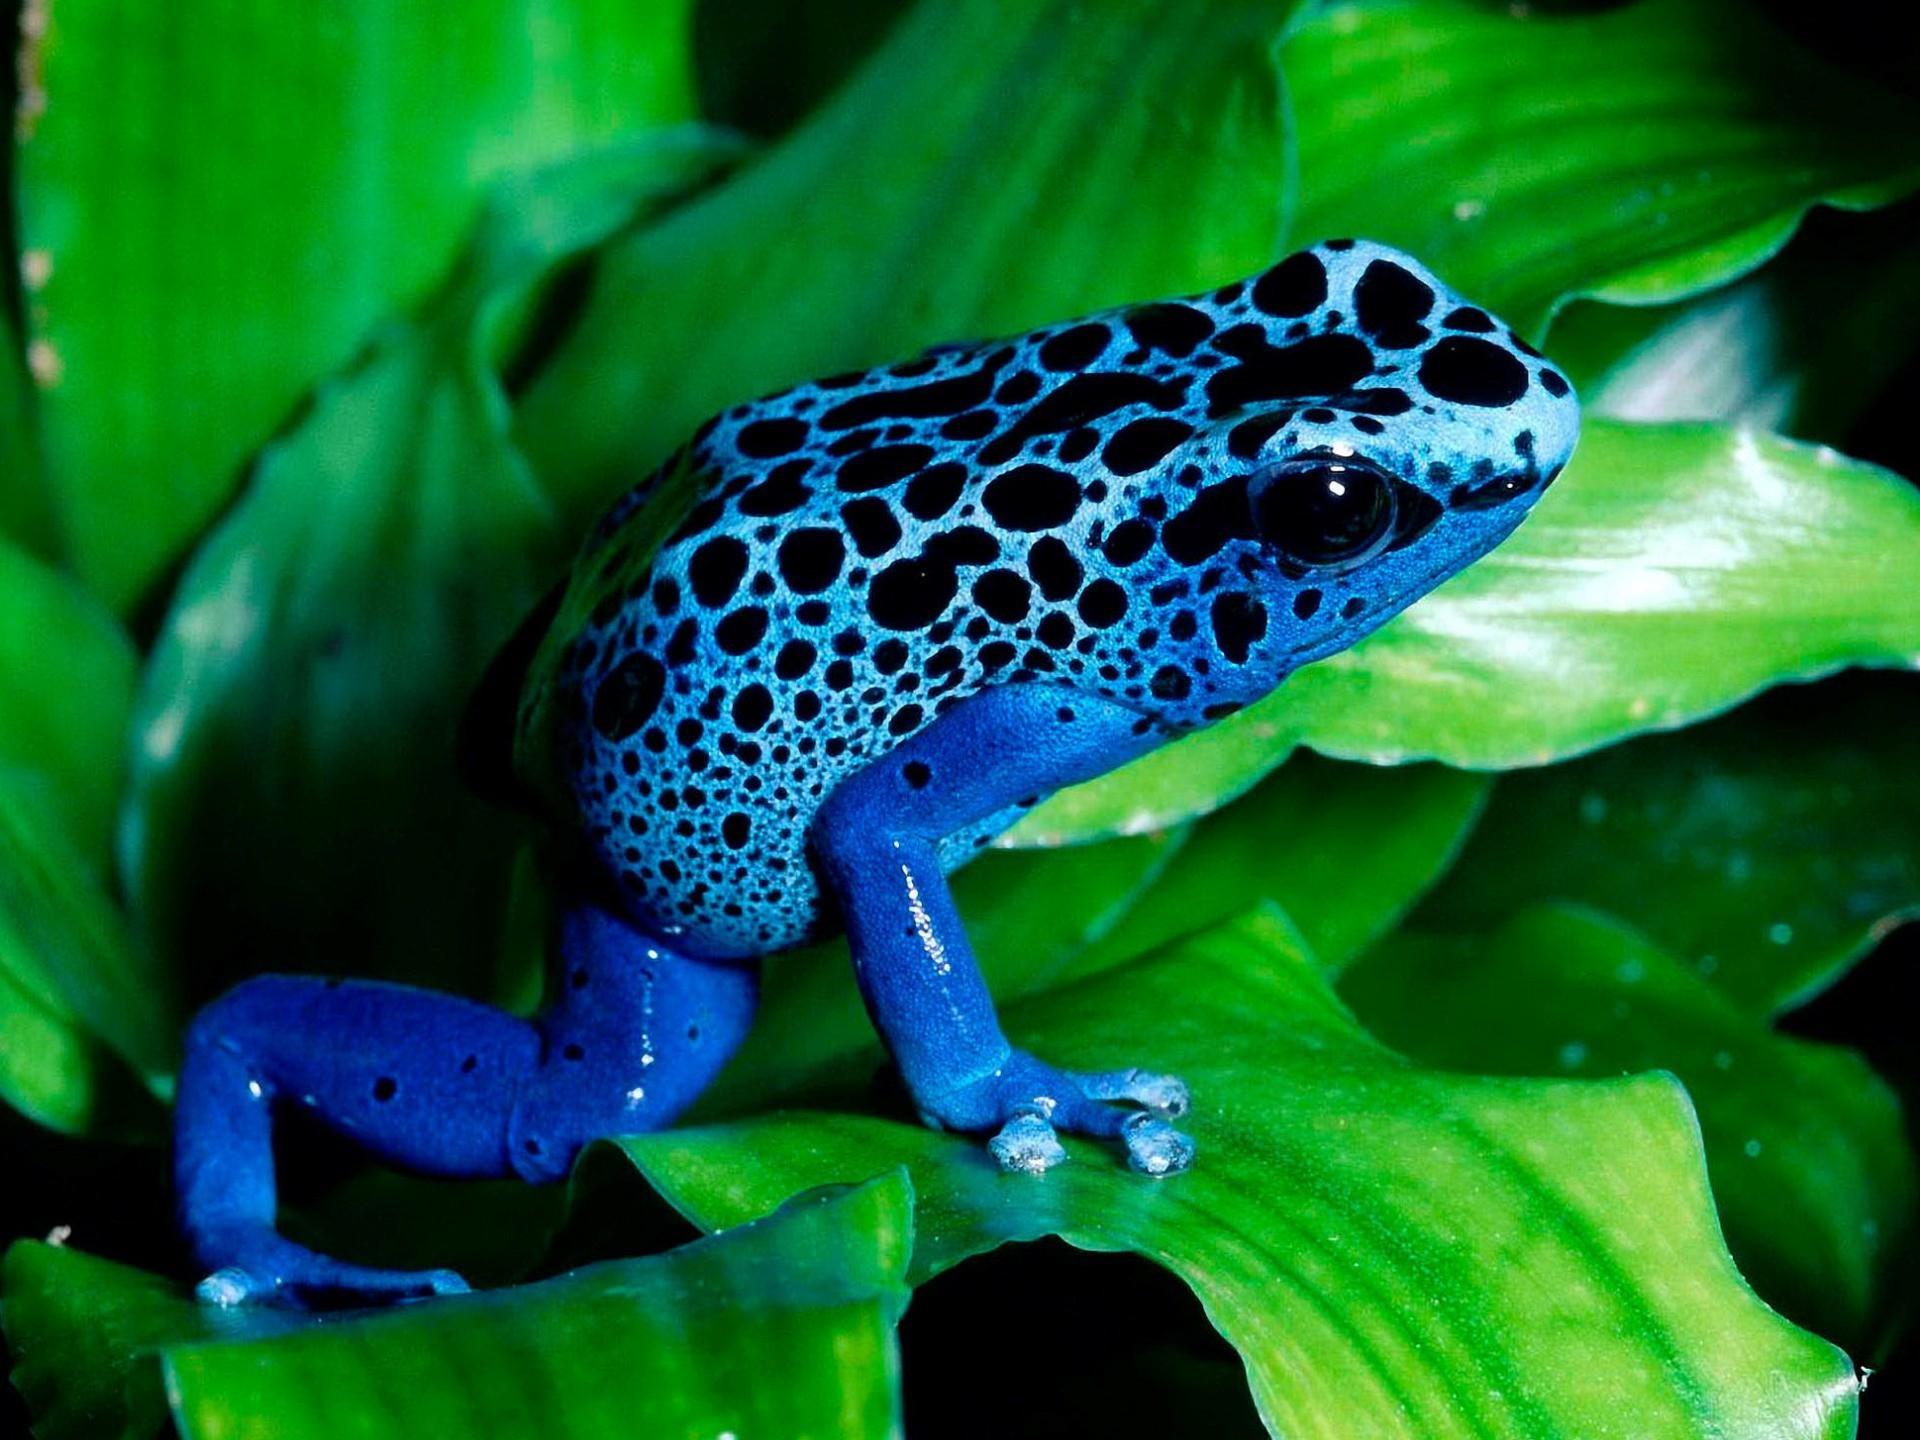 Grenouille Bleu